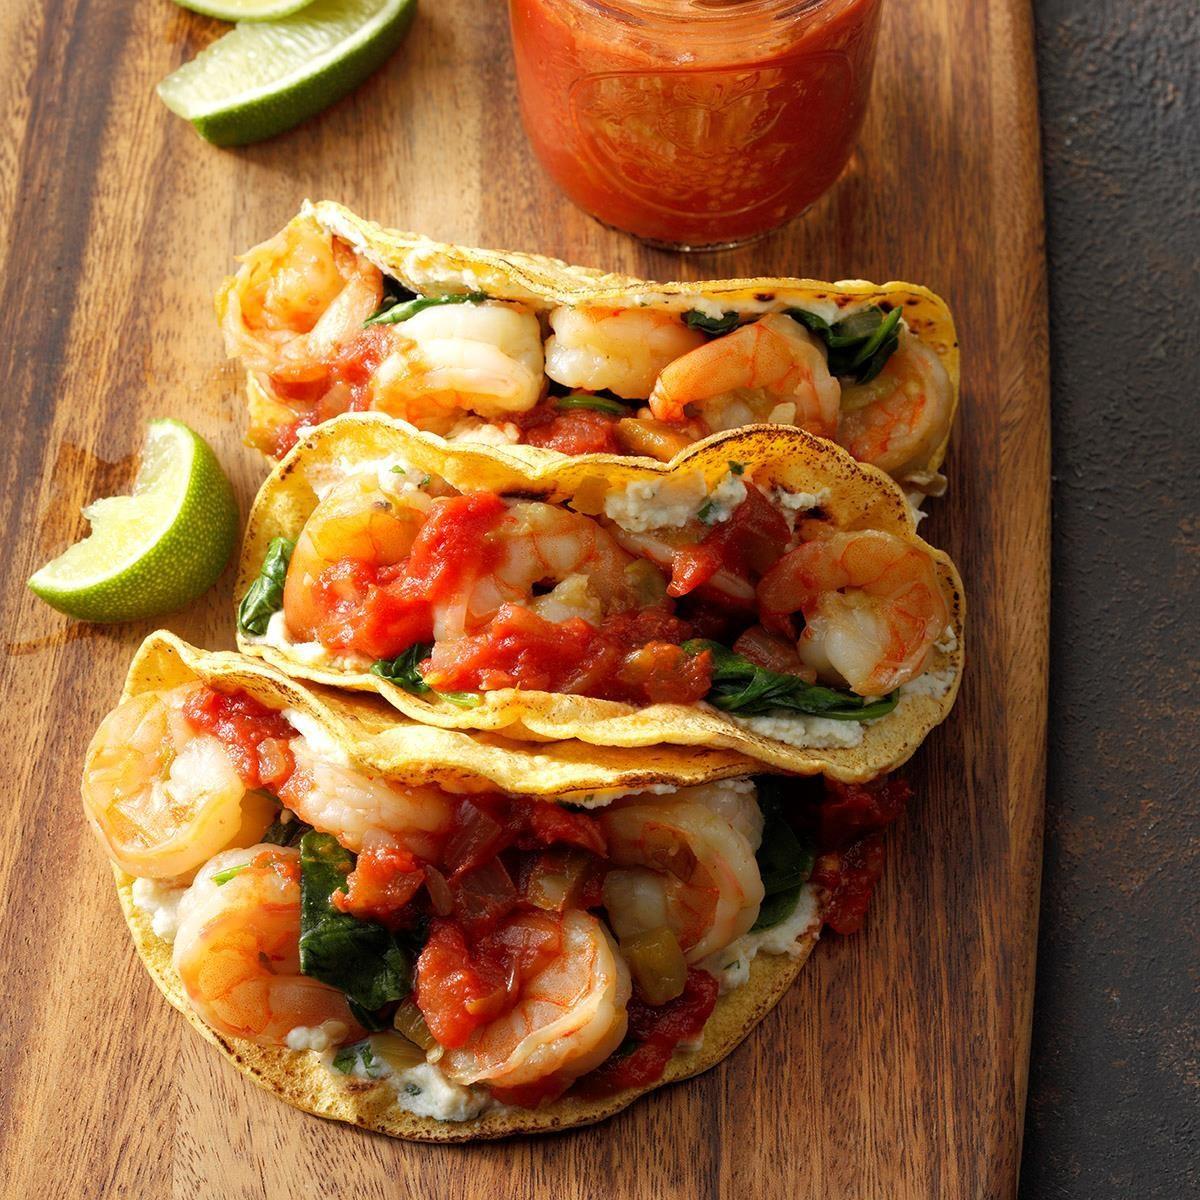 Spinach, Shrimp and Ricotta Tacos